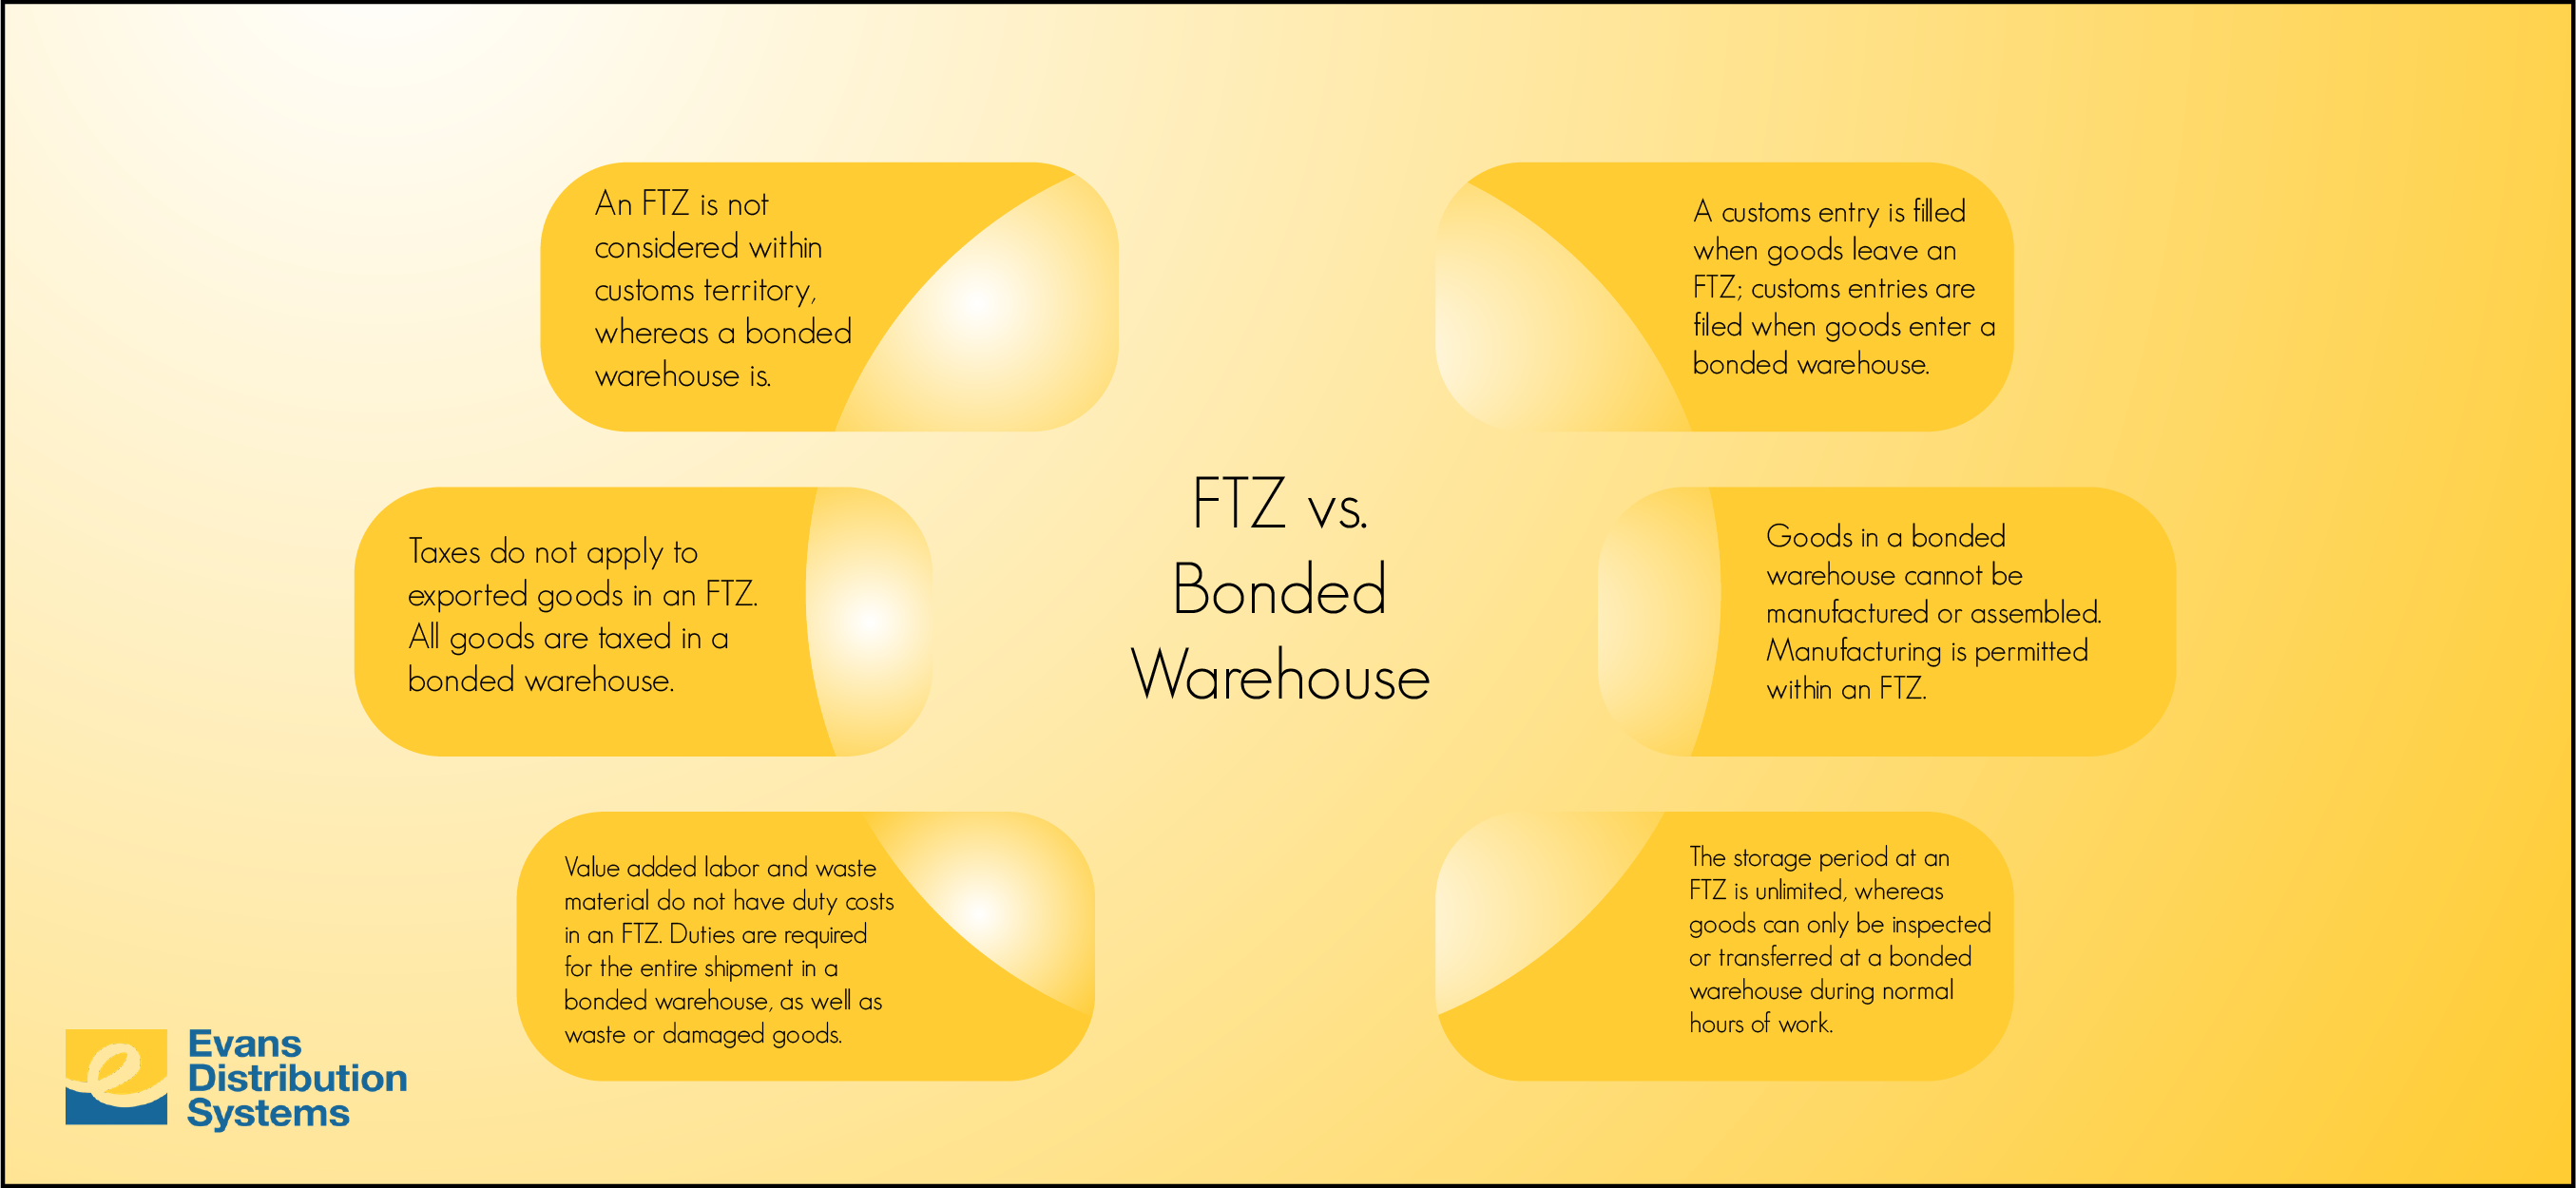 FTZ vs. Bonded Warehouse (infographic)